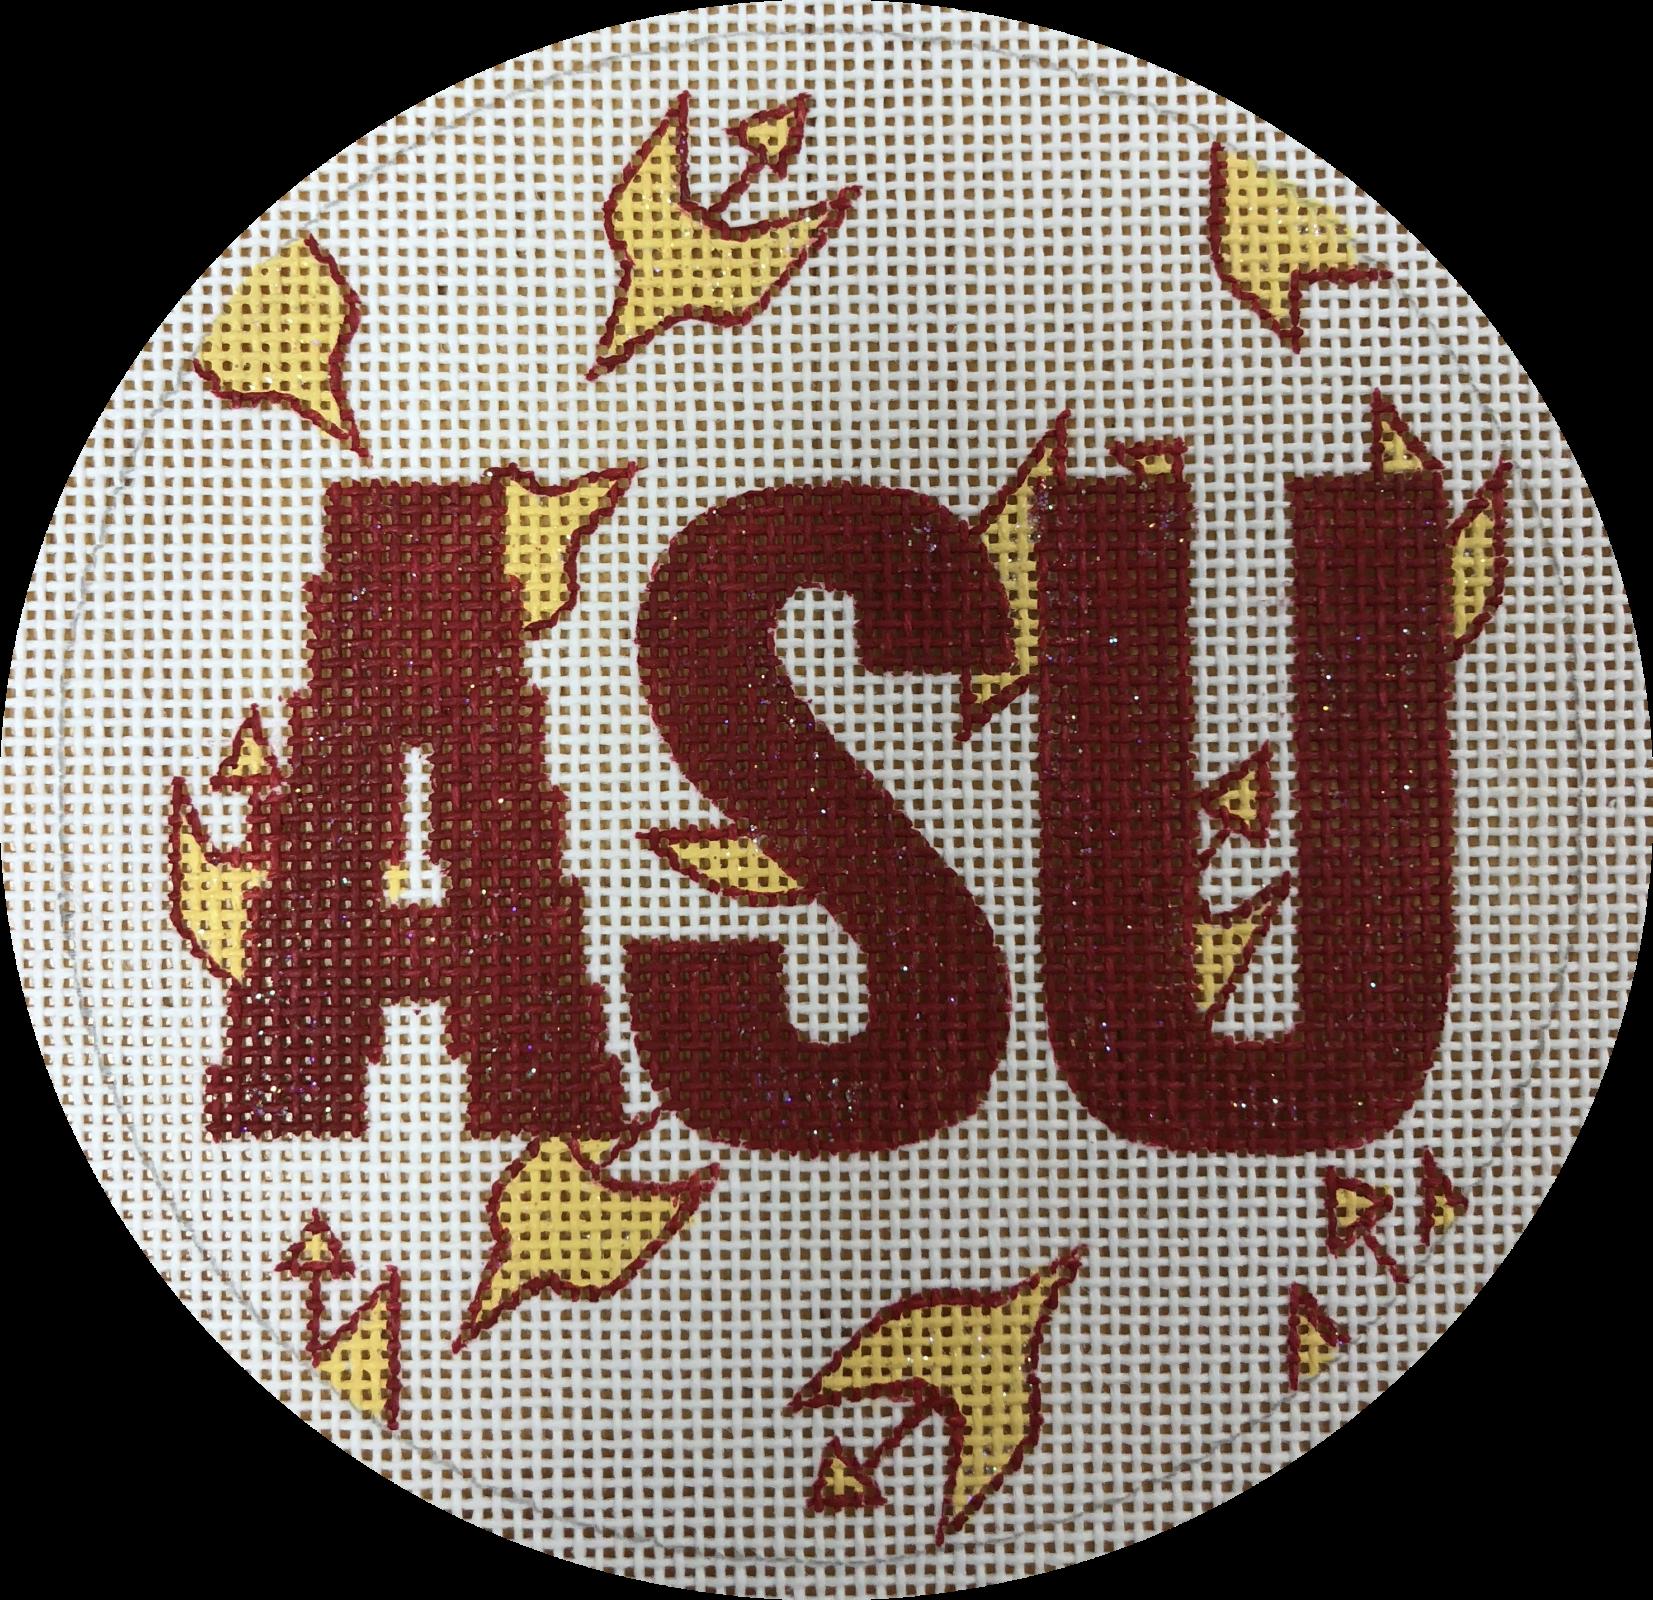 ASU round